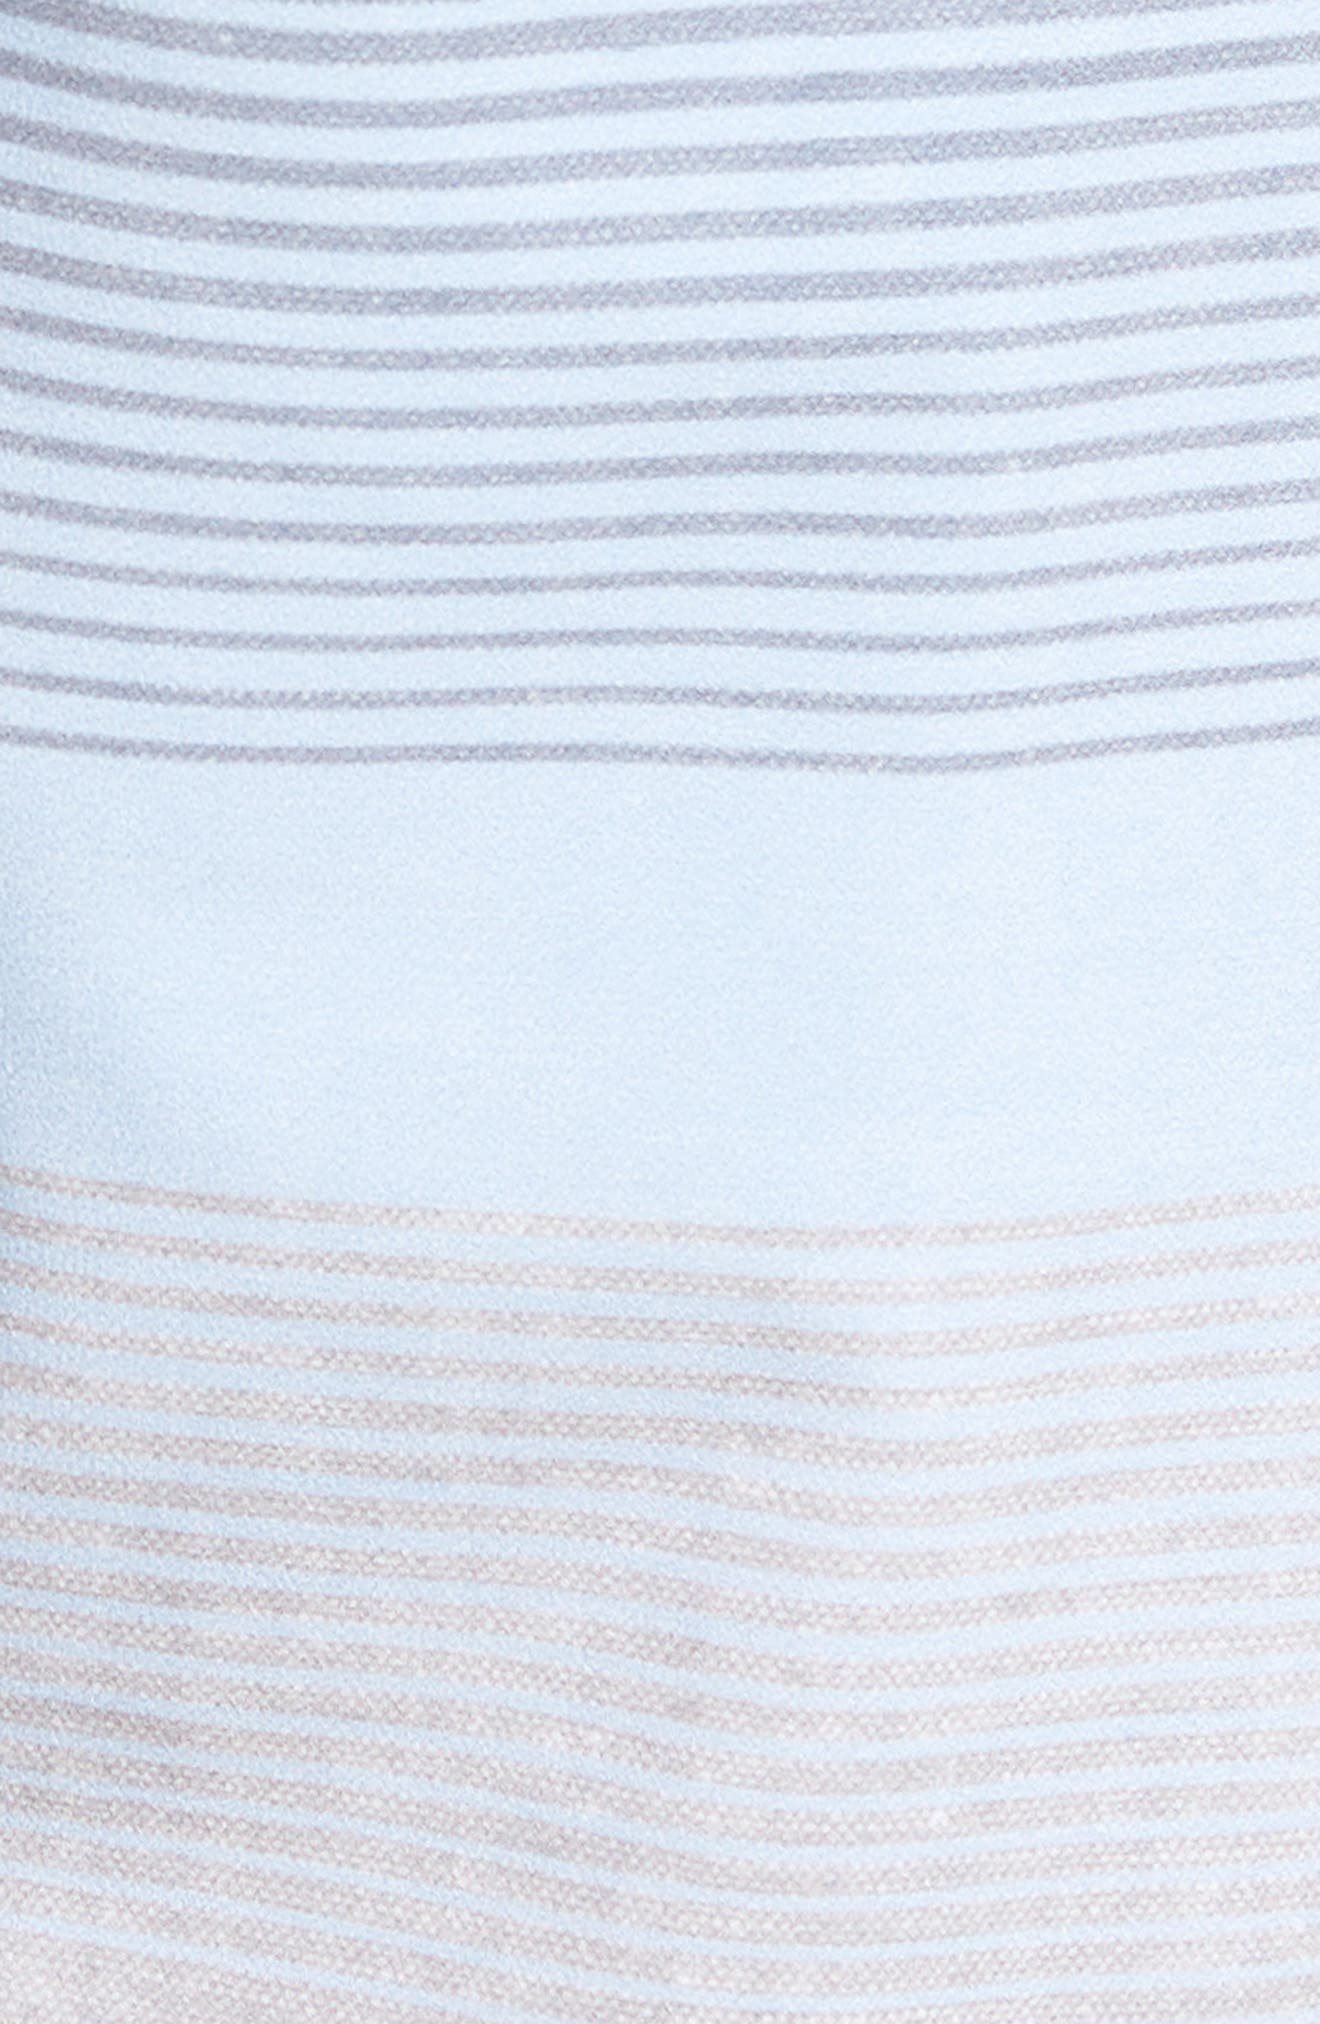 Seegrid Regular Fit Board Shorts,                             Alternate thumbnail 5, color,                             Heather Blue Nights